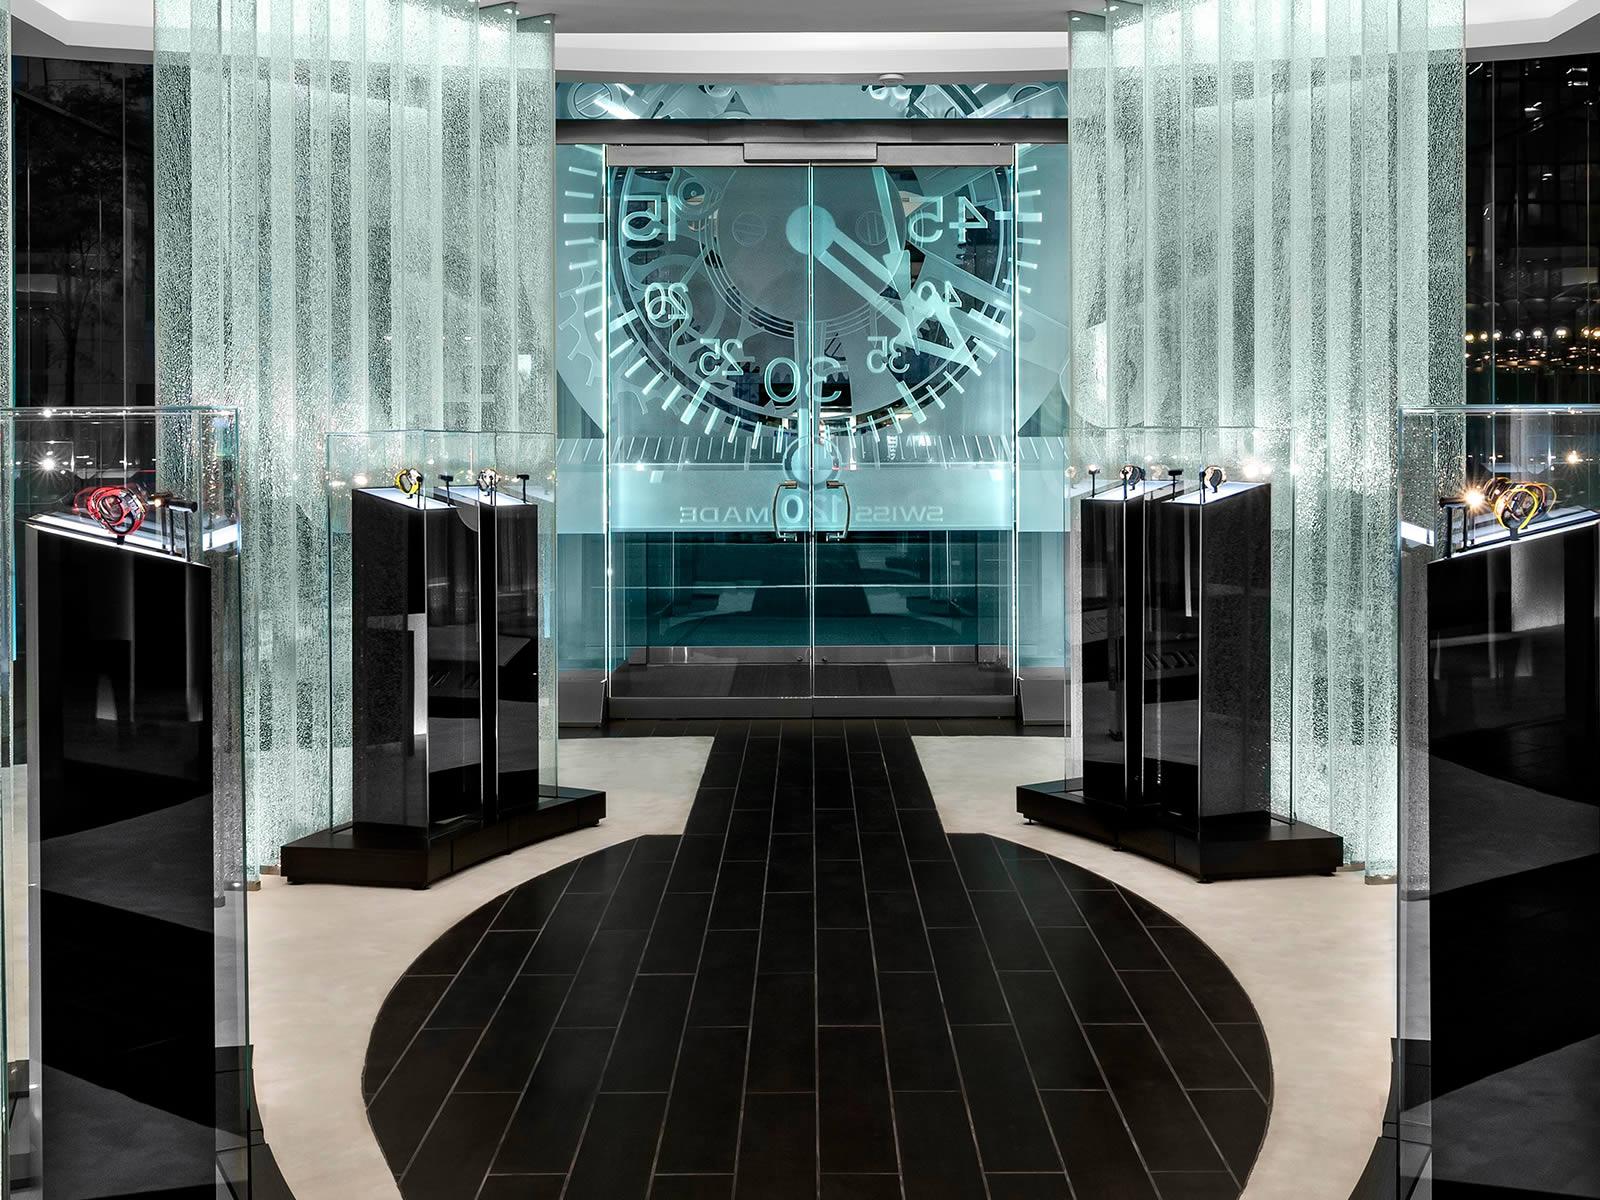 richard-mille-new-york-butik-6-.jpg